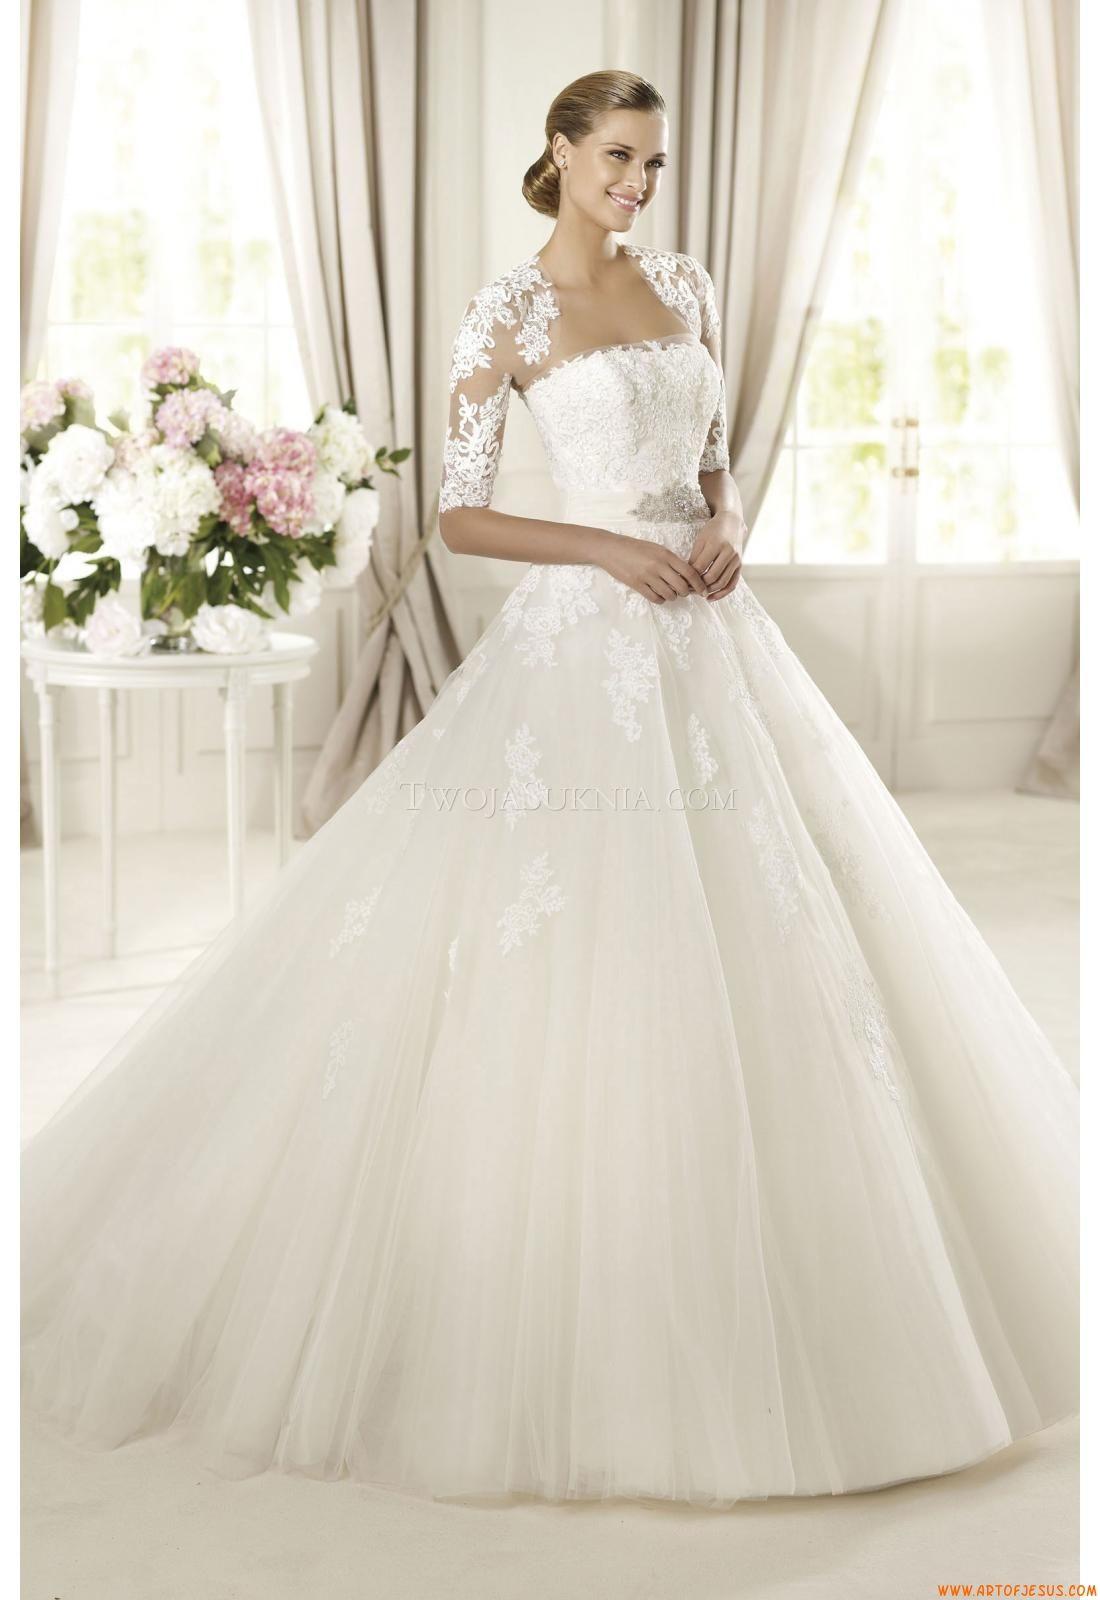 Brautkleider Pronovias Domingo 2013 | Wedding dress | Pinterest ...